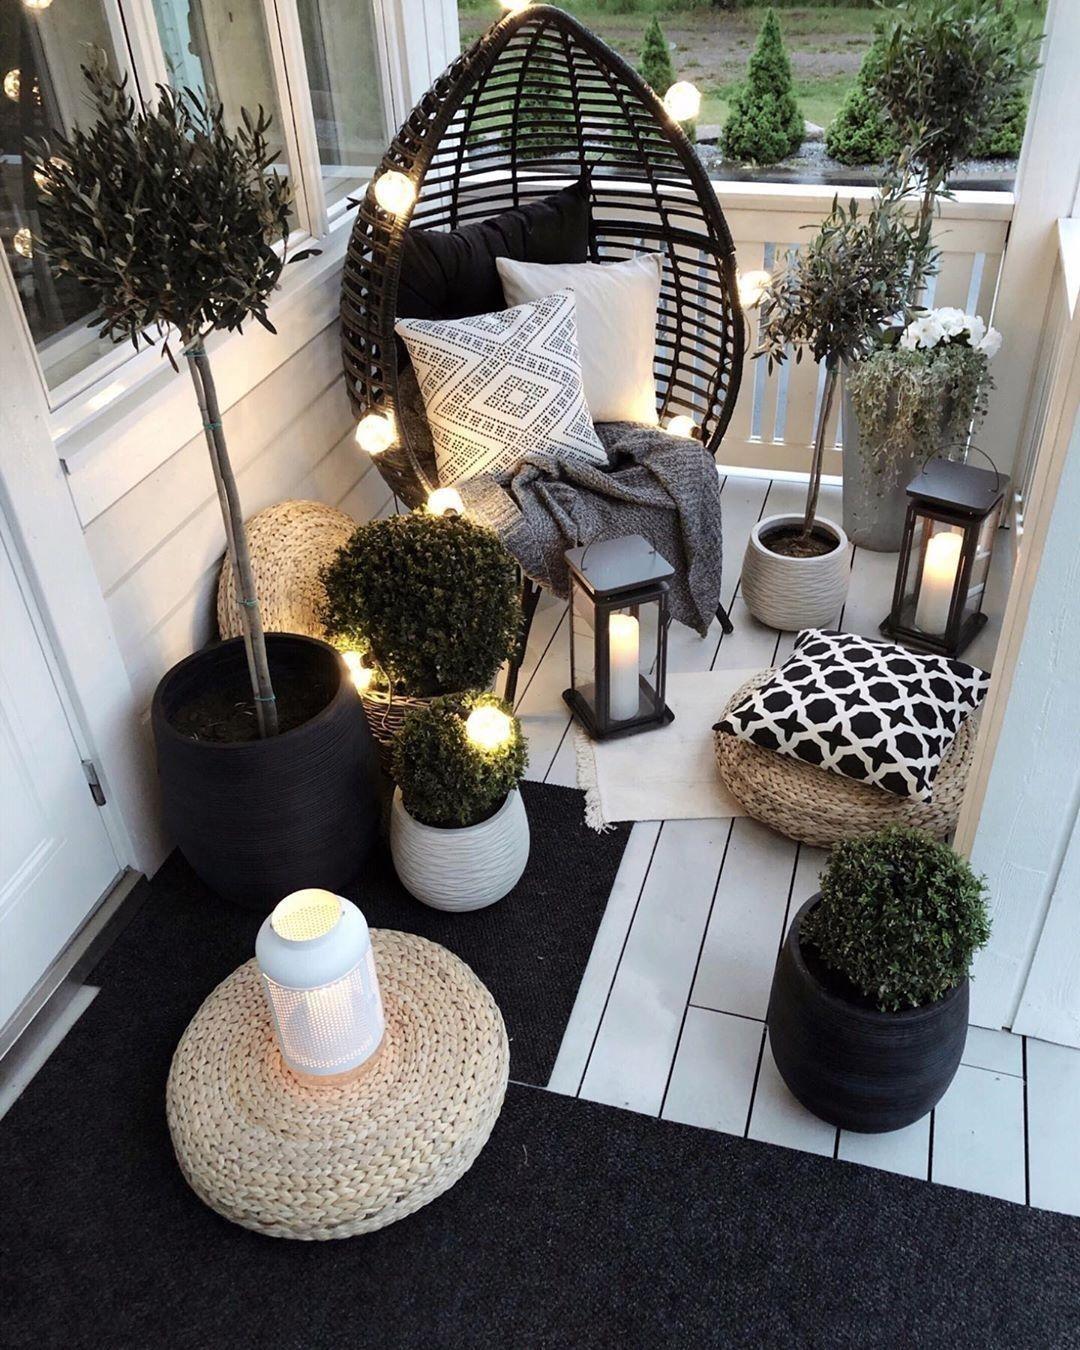 m u r i e l v h u i z e n In 2020 Small Balcony Decor Outdoor Furniture Design Beautiful Outdoor Furniture